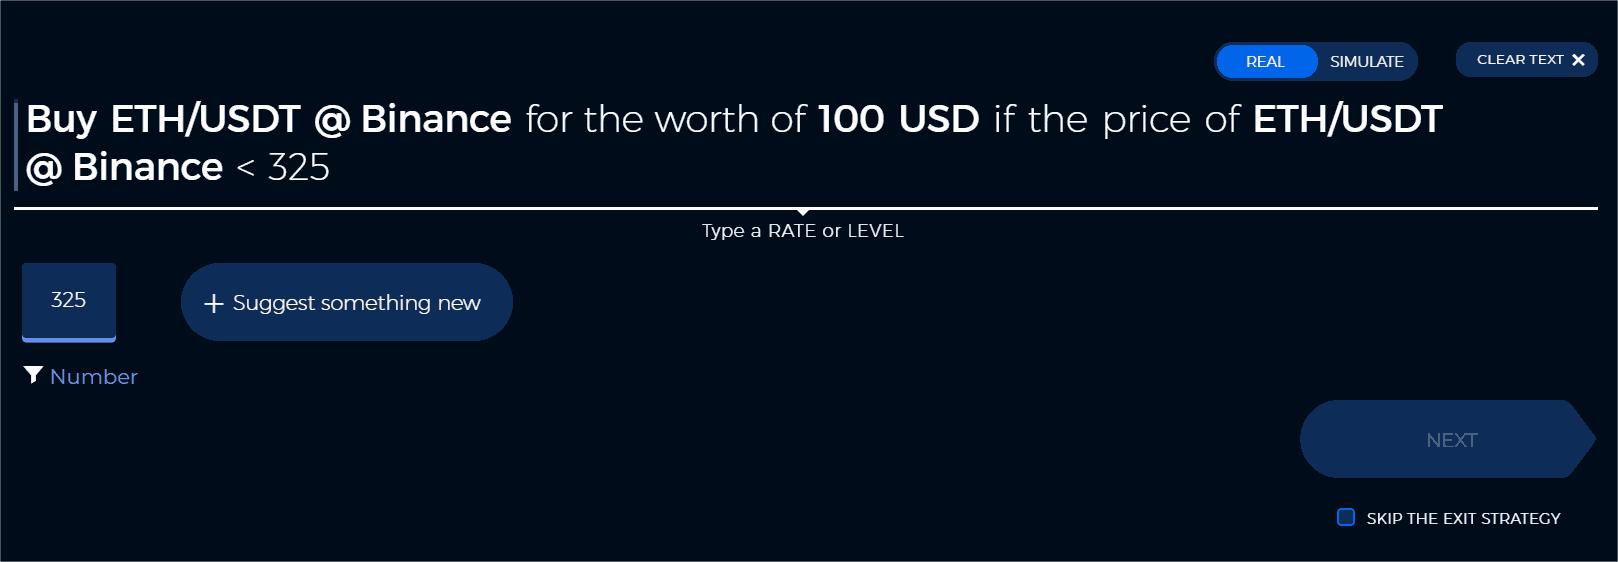 buy 100 worth of bitcoin